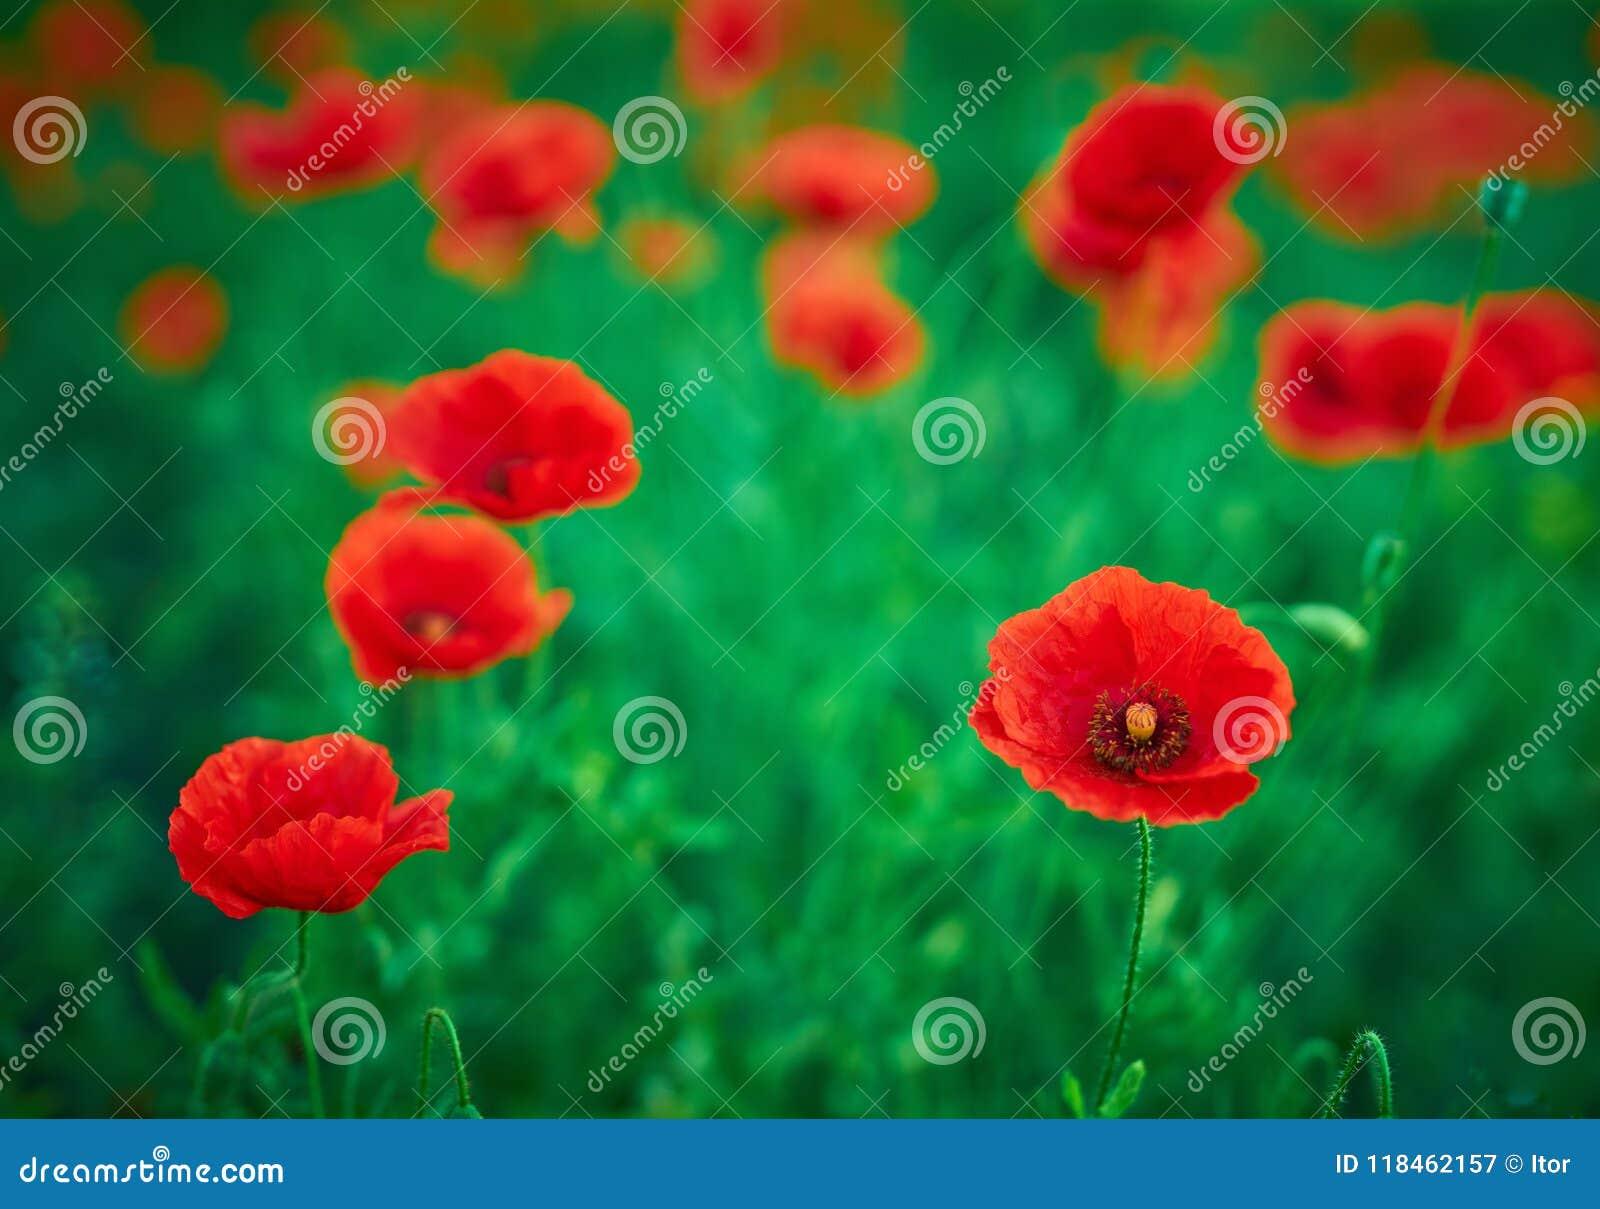 Selective Focus On Poppy Flower Wild Poppy Flowers In Natural G